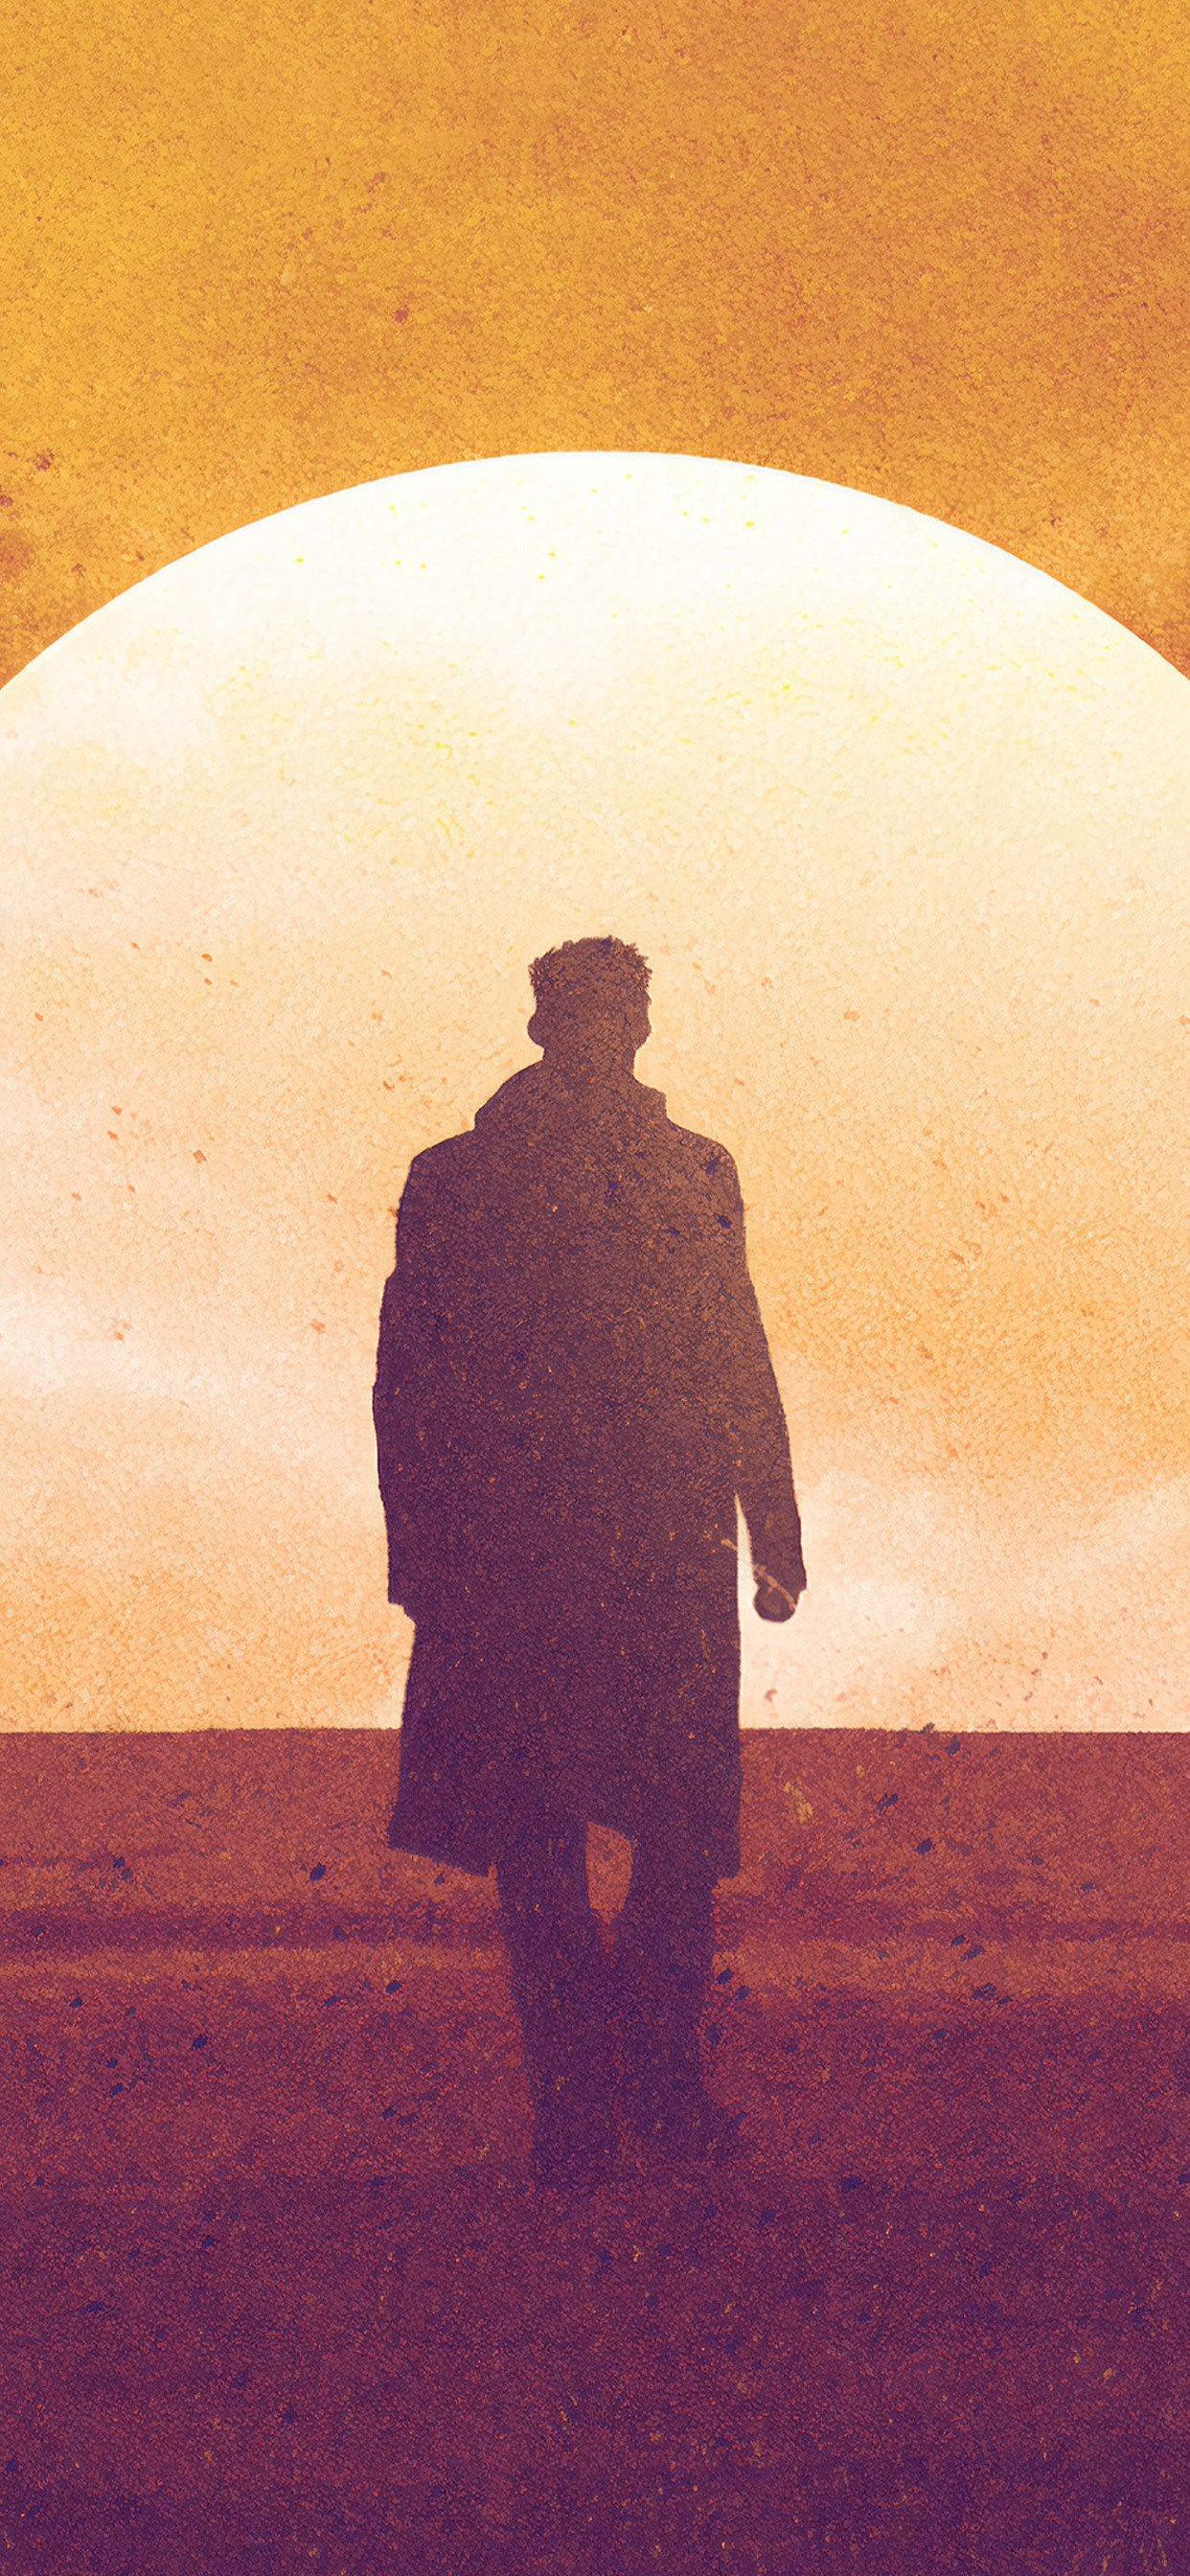 Blade Runner 2049 Art 4k Iphone Wallpapers Free Download